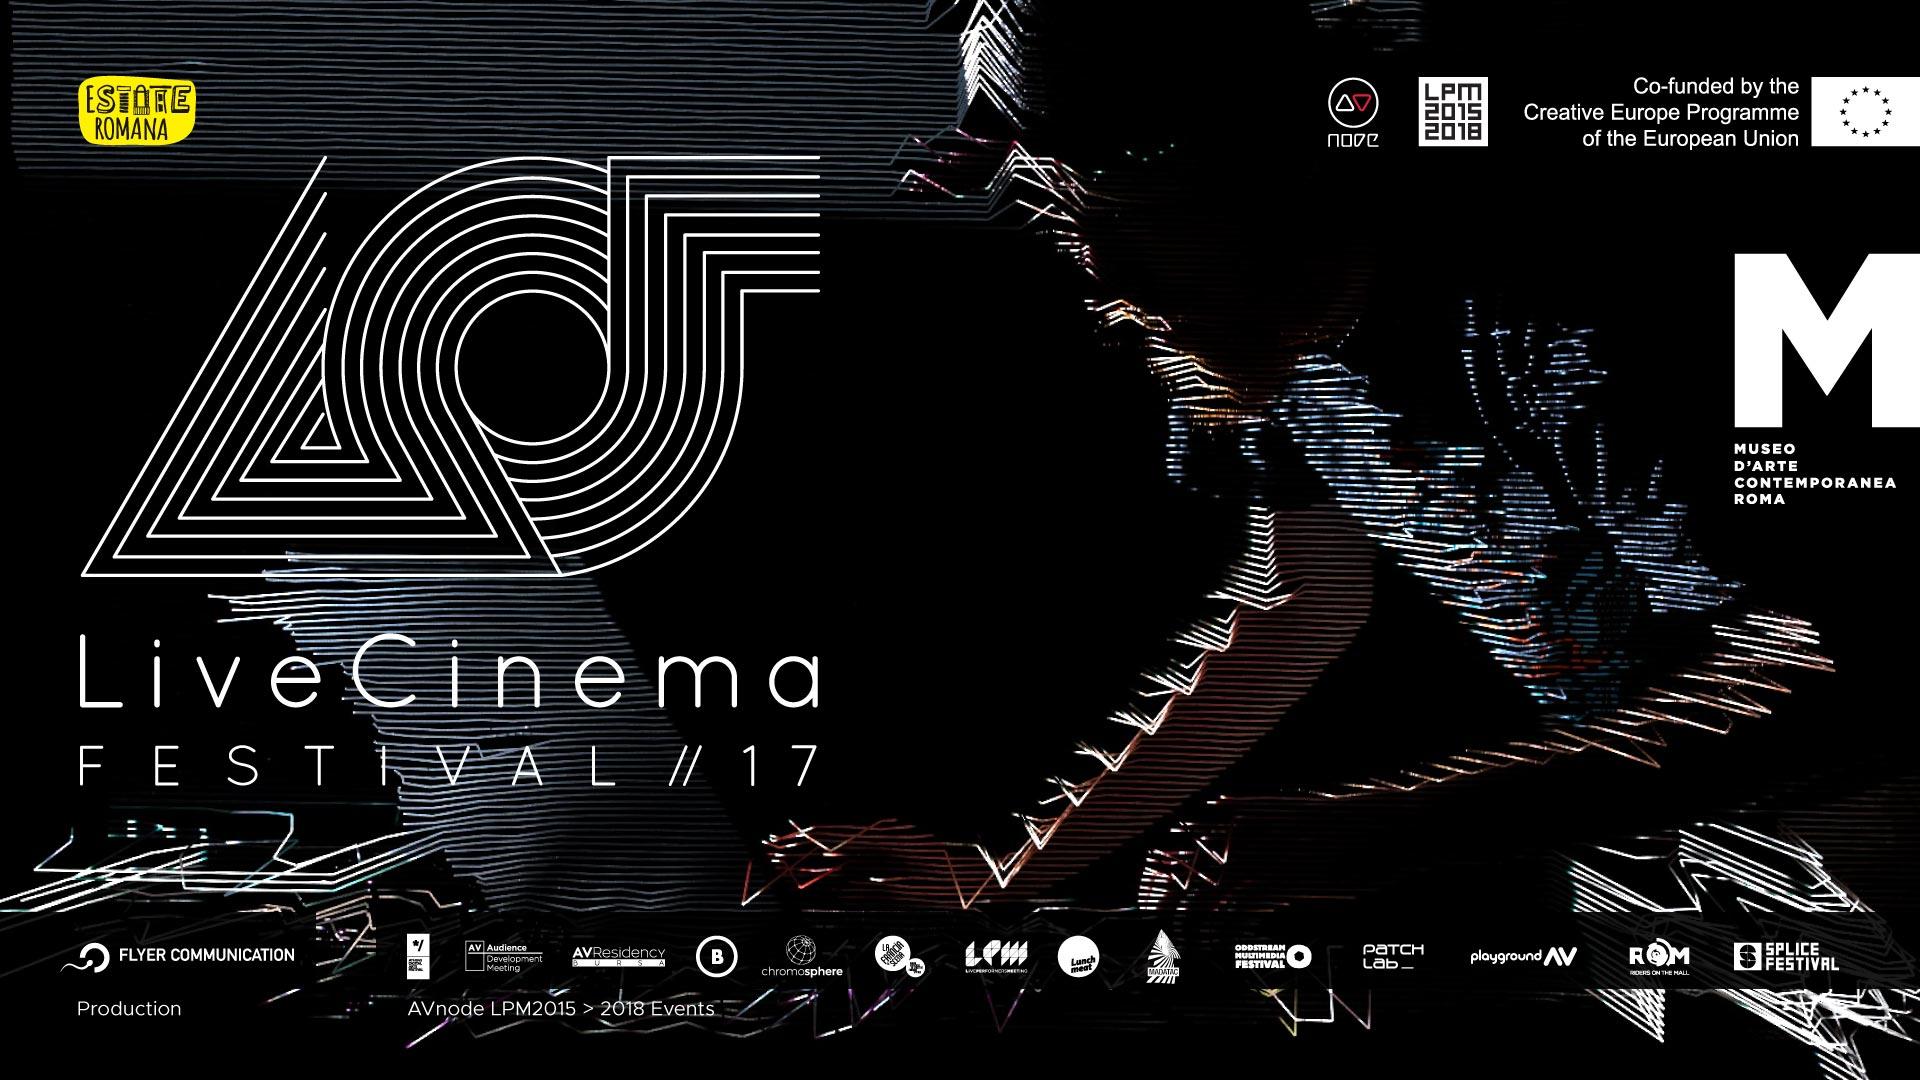 Live Cinema Festival 2017 | LPM 2015 > 2018